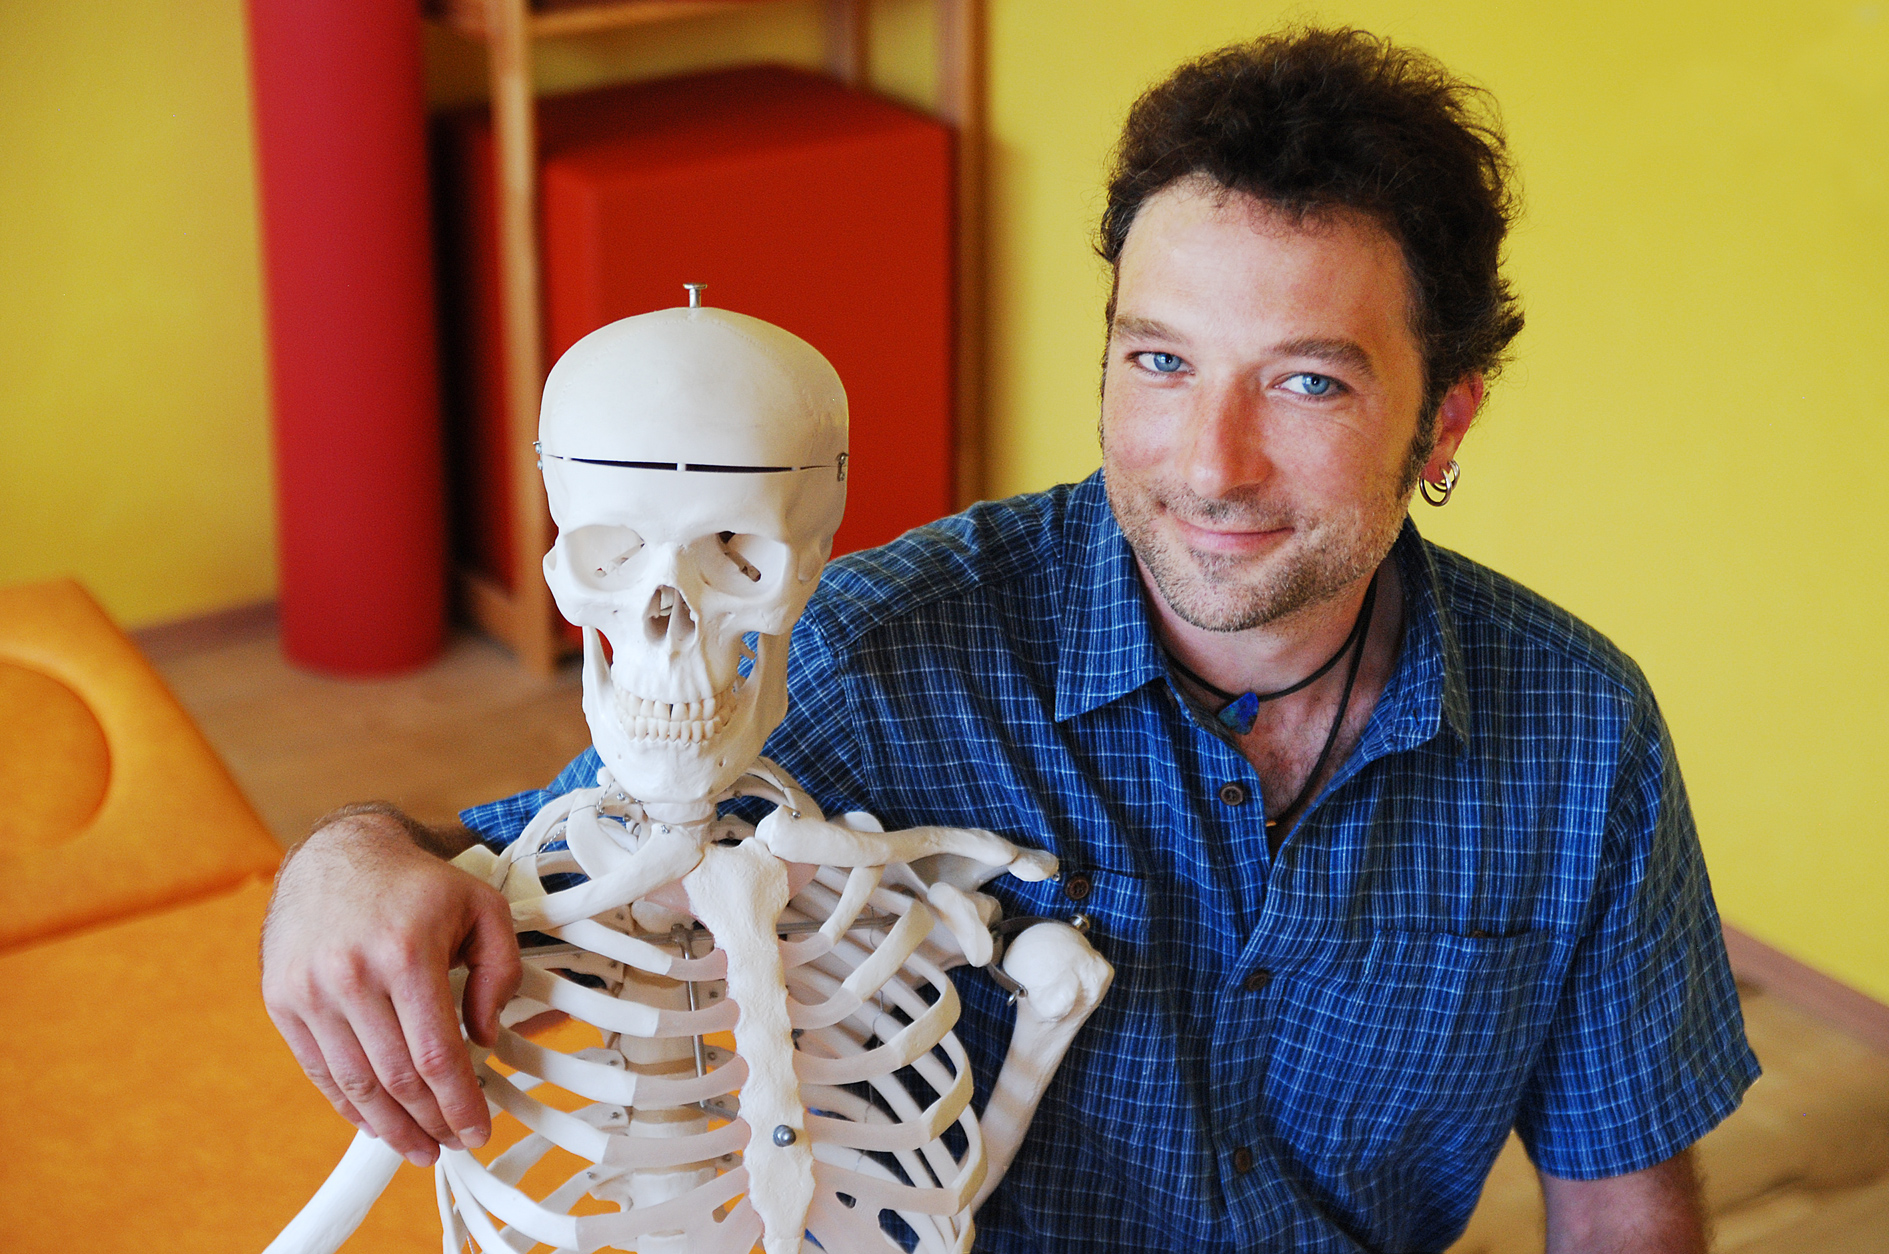 Christian Kleffner umarmt ein Skelett